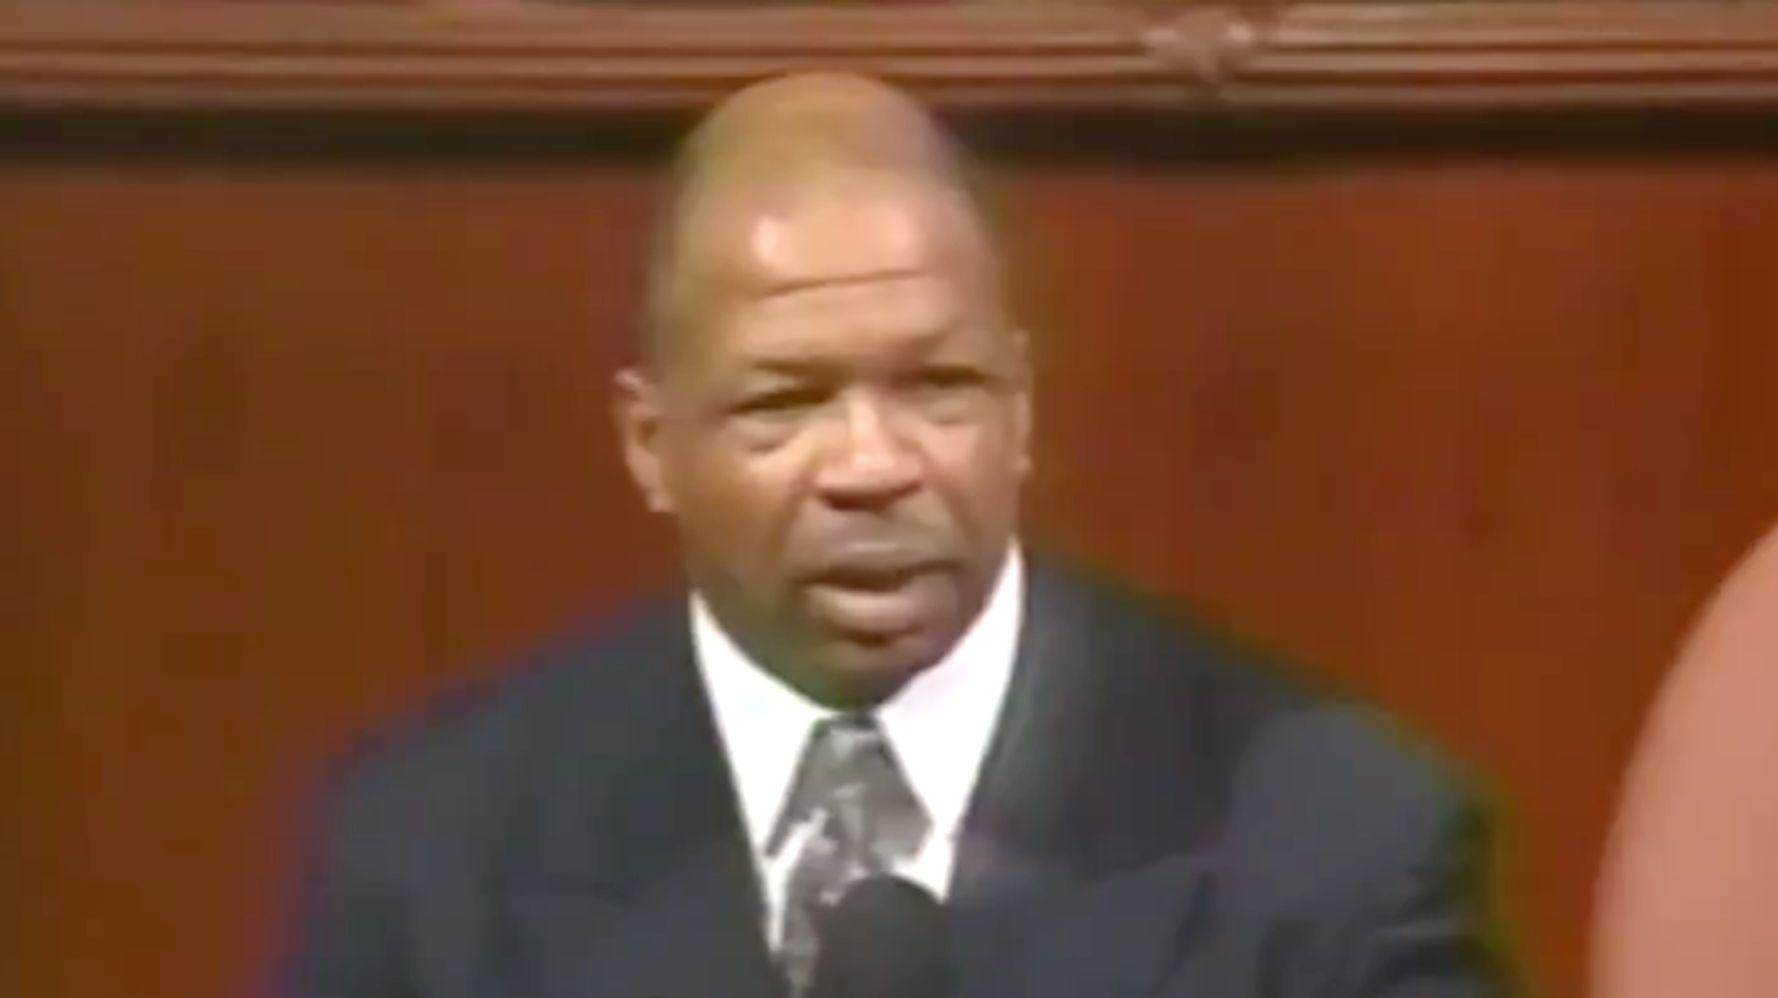 Westlake Legal Group 5da872802000000210505f9e Elijah Cummings' Poetic First Speech On The House Floor Goes Viral